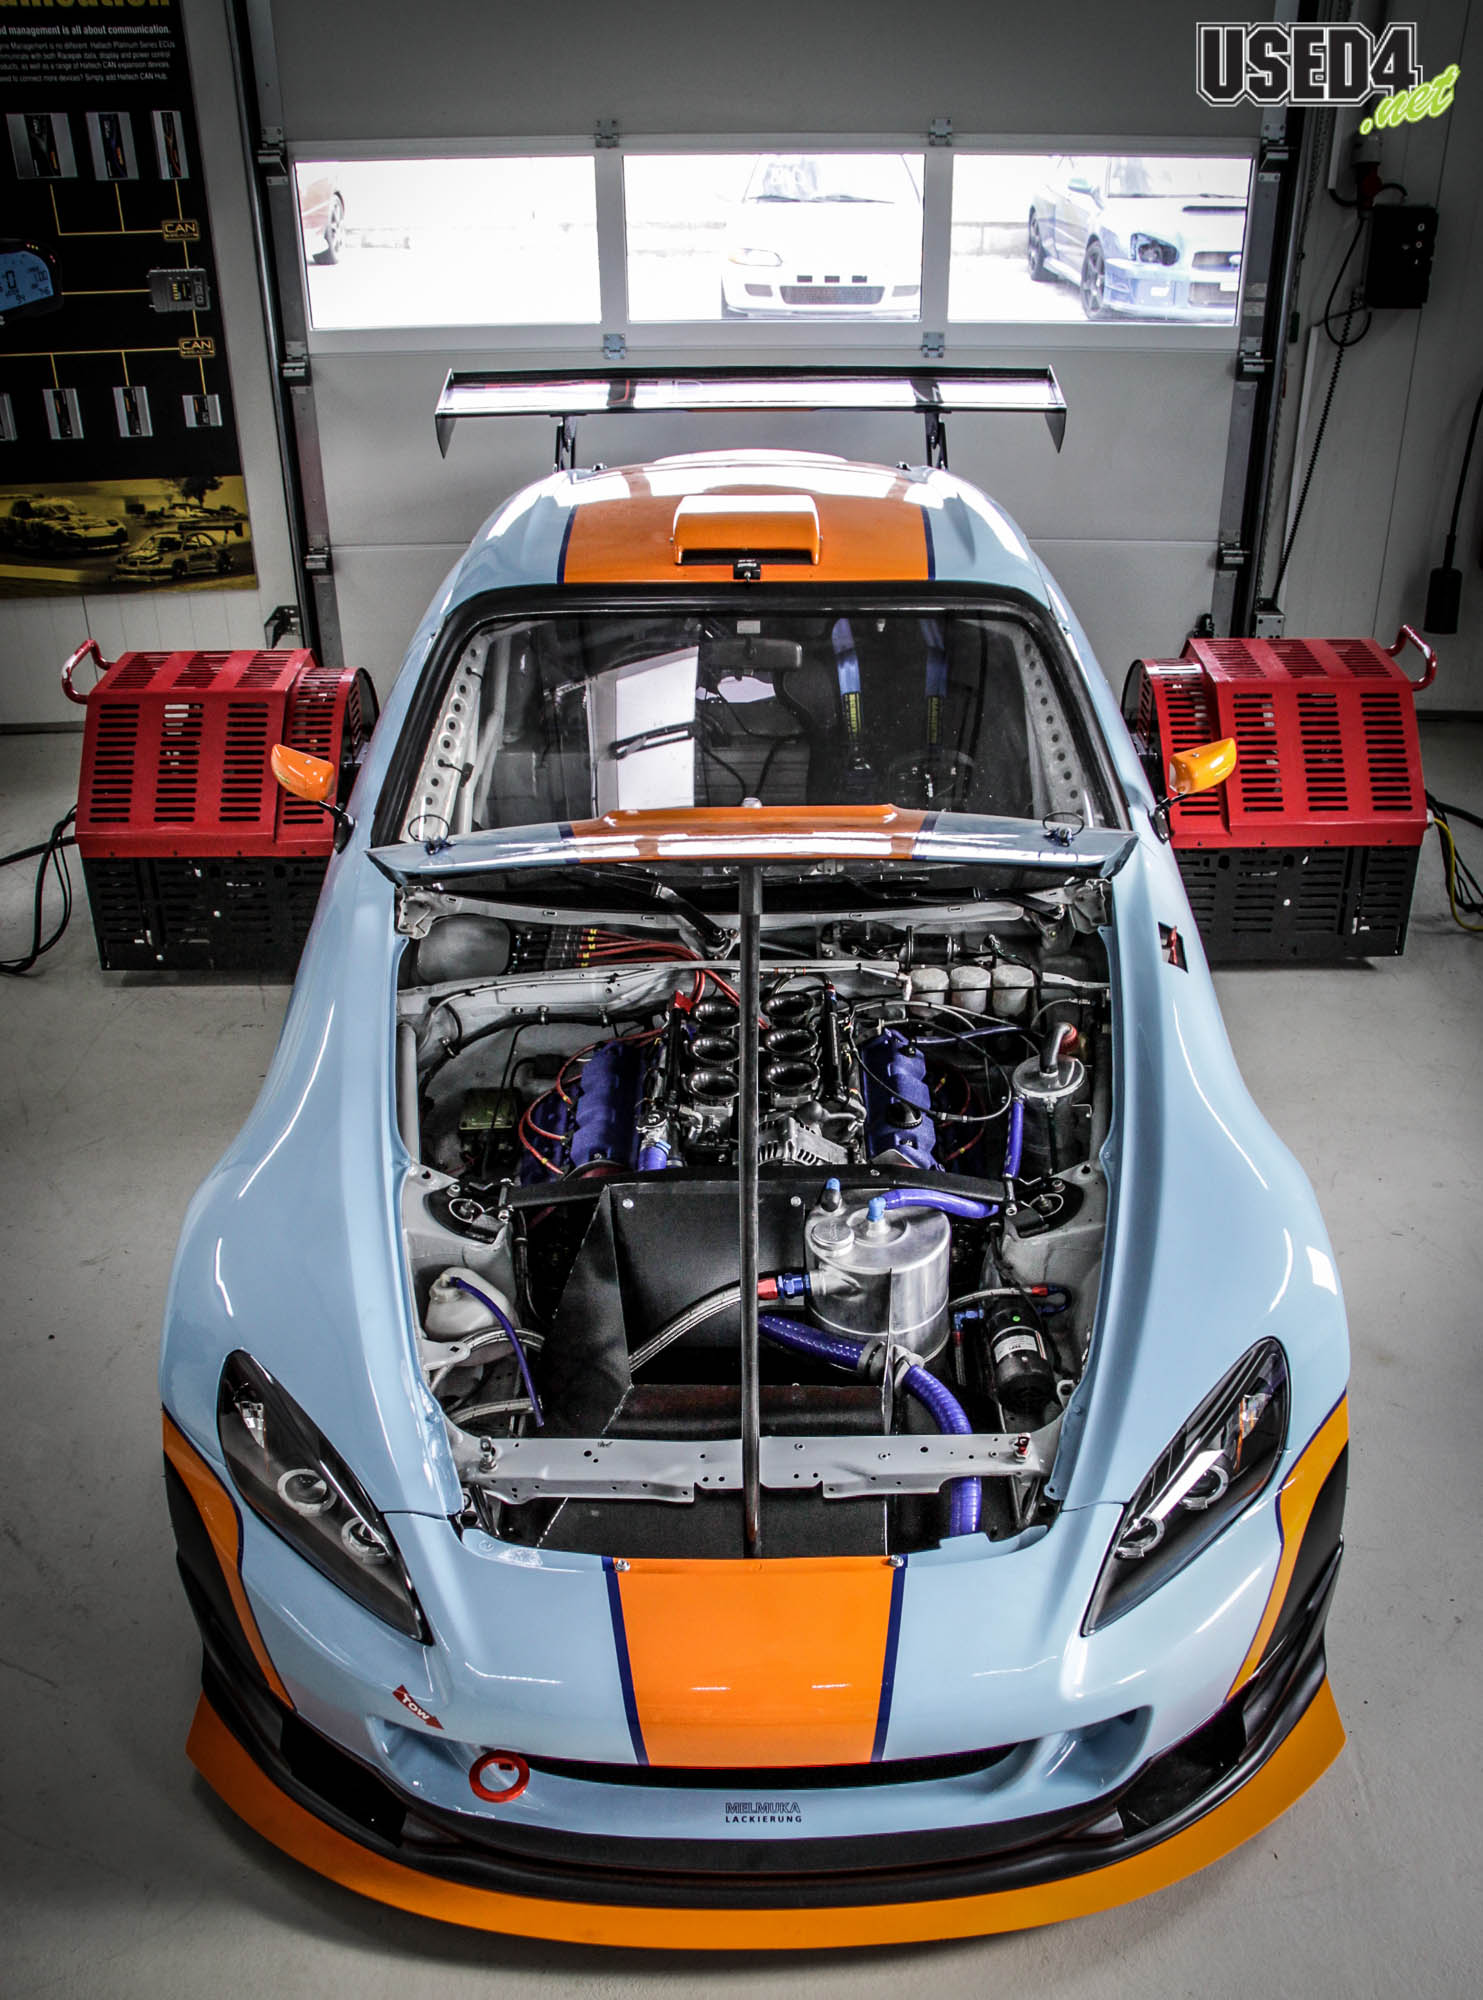 honda s2000 gets 450 hp nsx engine becomes honda s3500